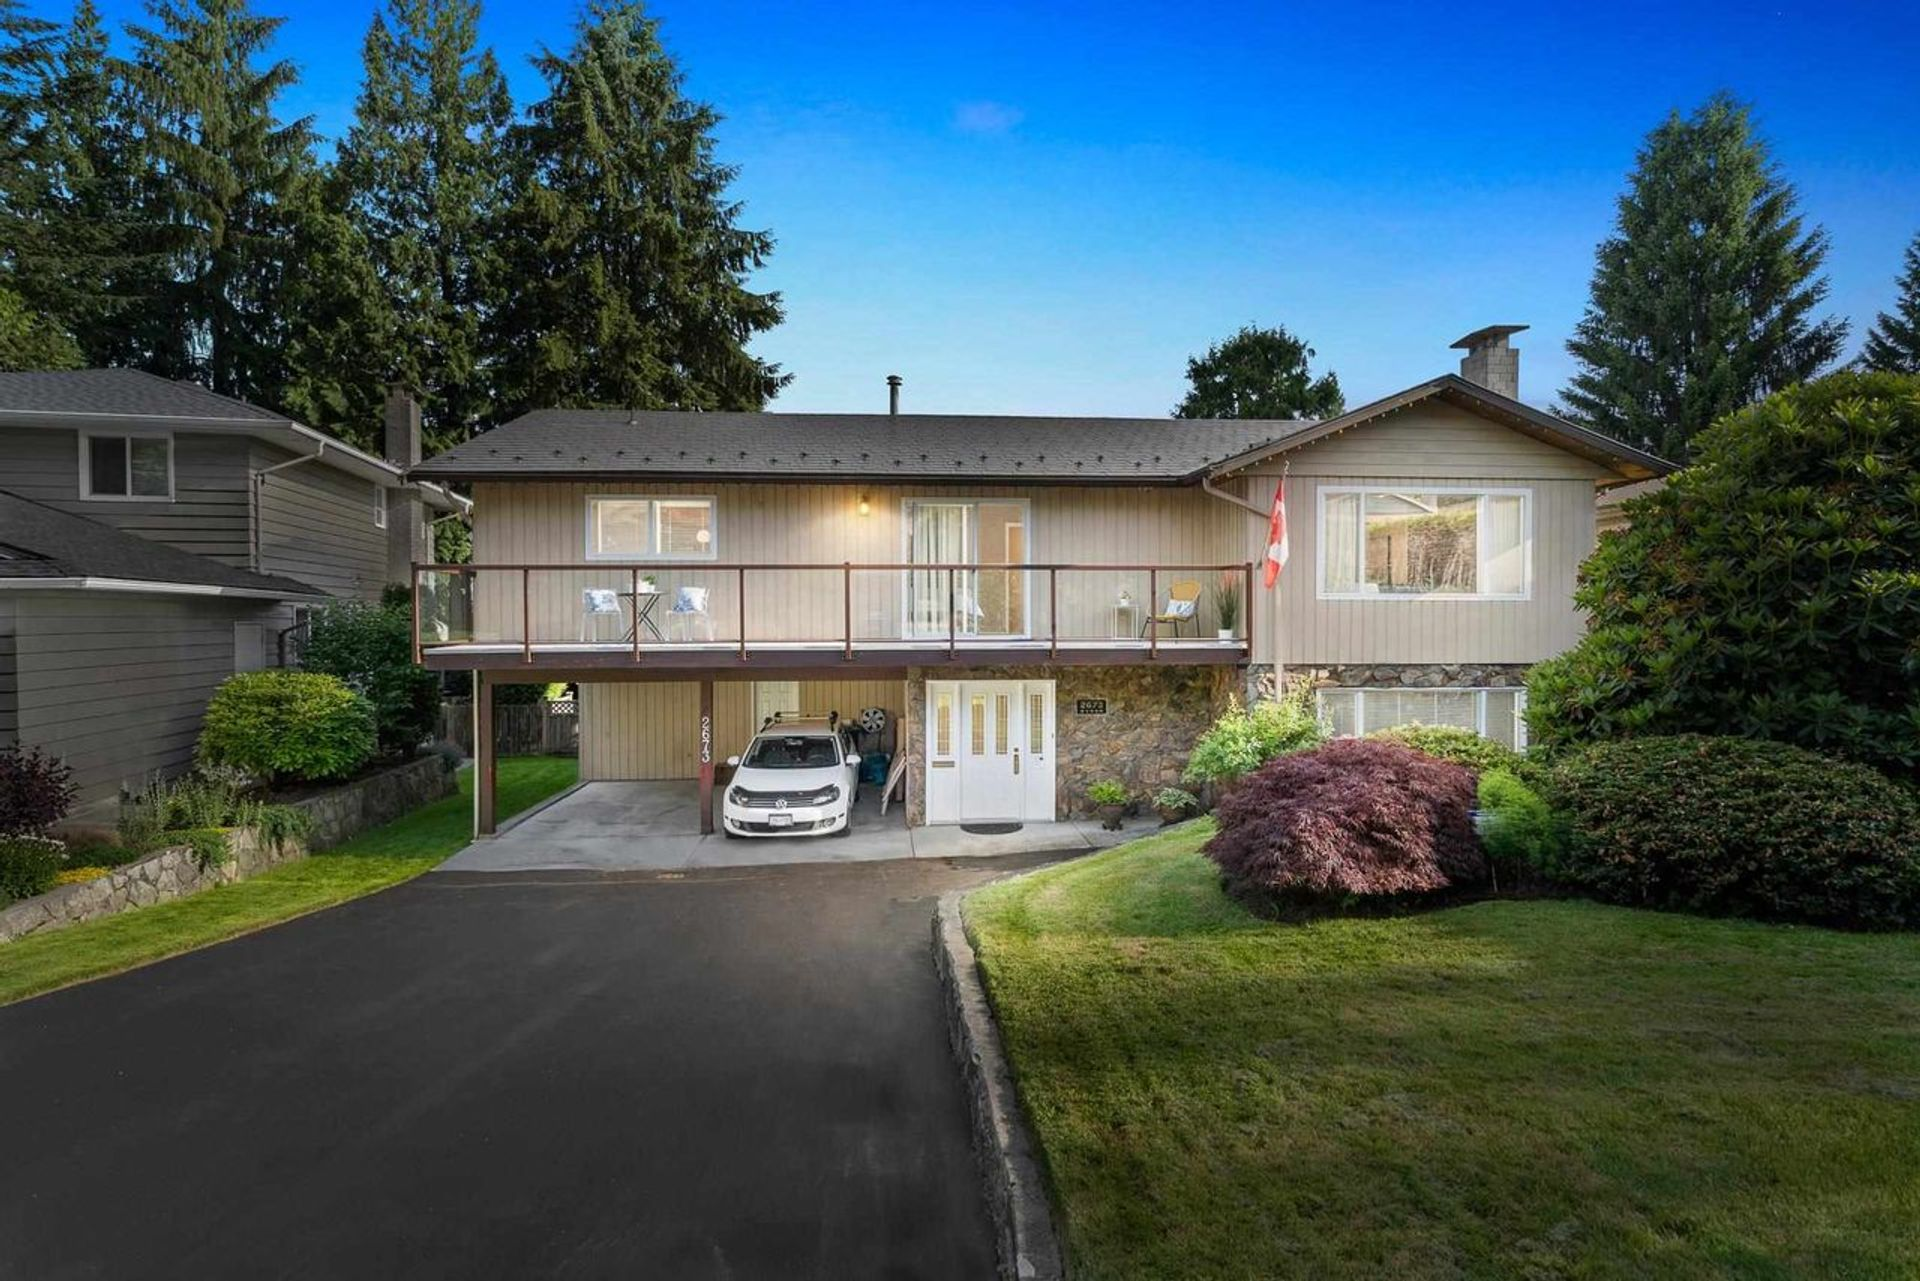 2673-byron-road-blueridge-nv-north-vancouver-01 at 2673 Byron Road, Blueridge NV, North Vancouver